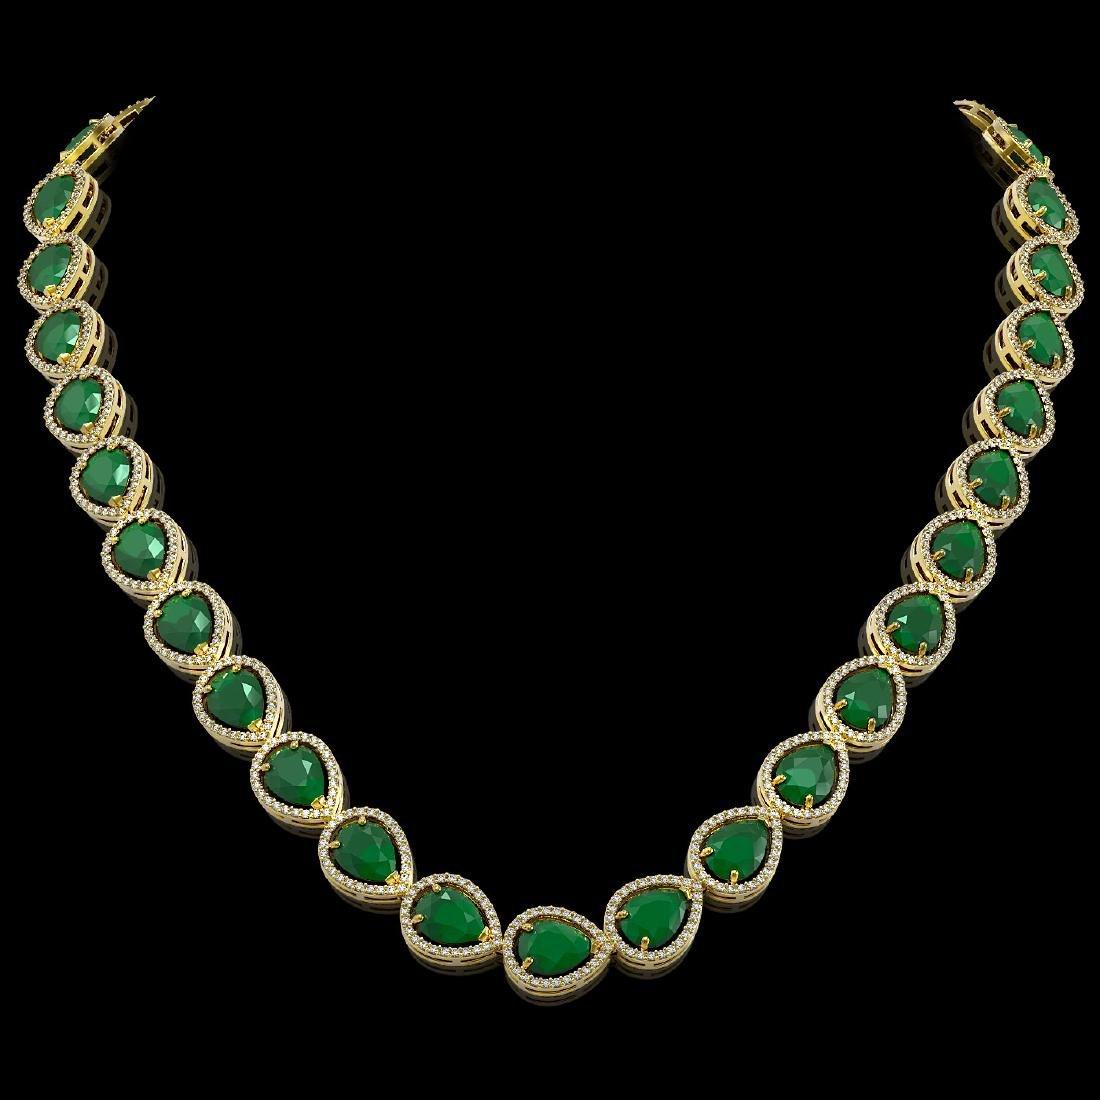 64.01 CTW Emerald & Diamond Halo Necklace 10K Yellow